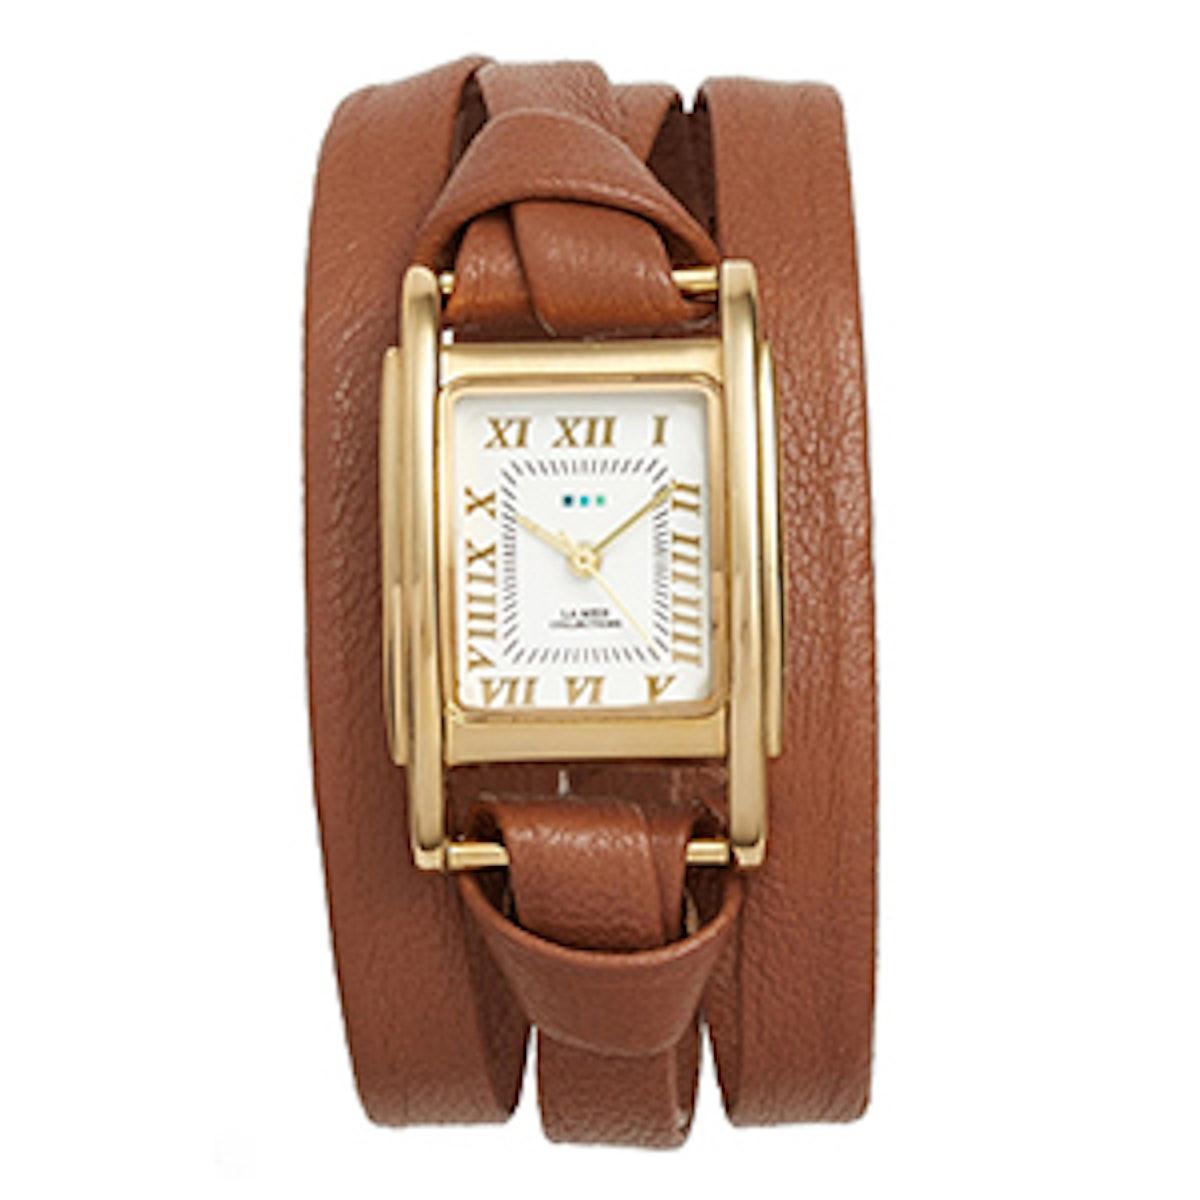 Milwood Leather Wrap Watch